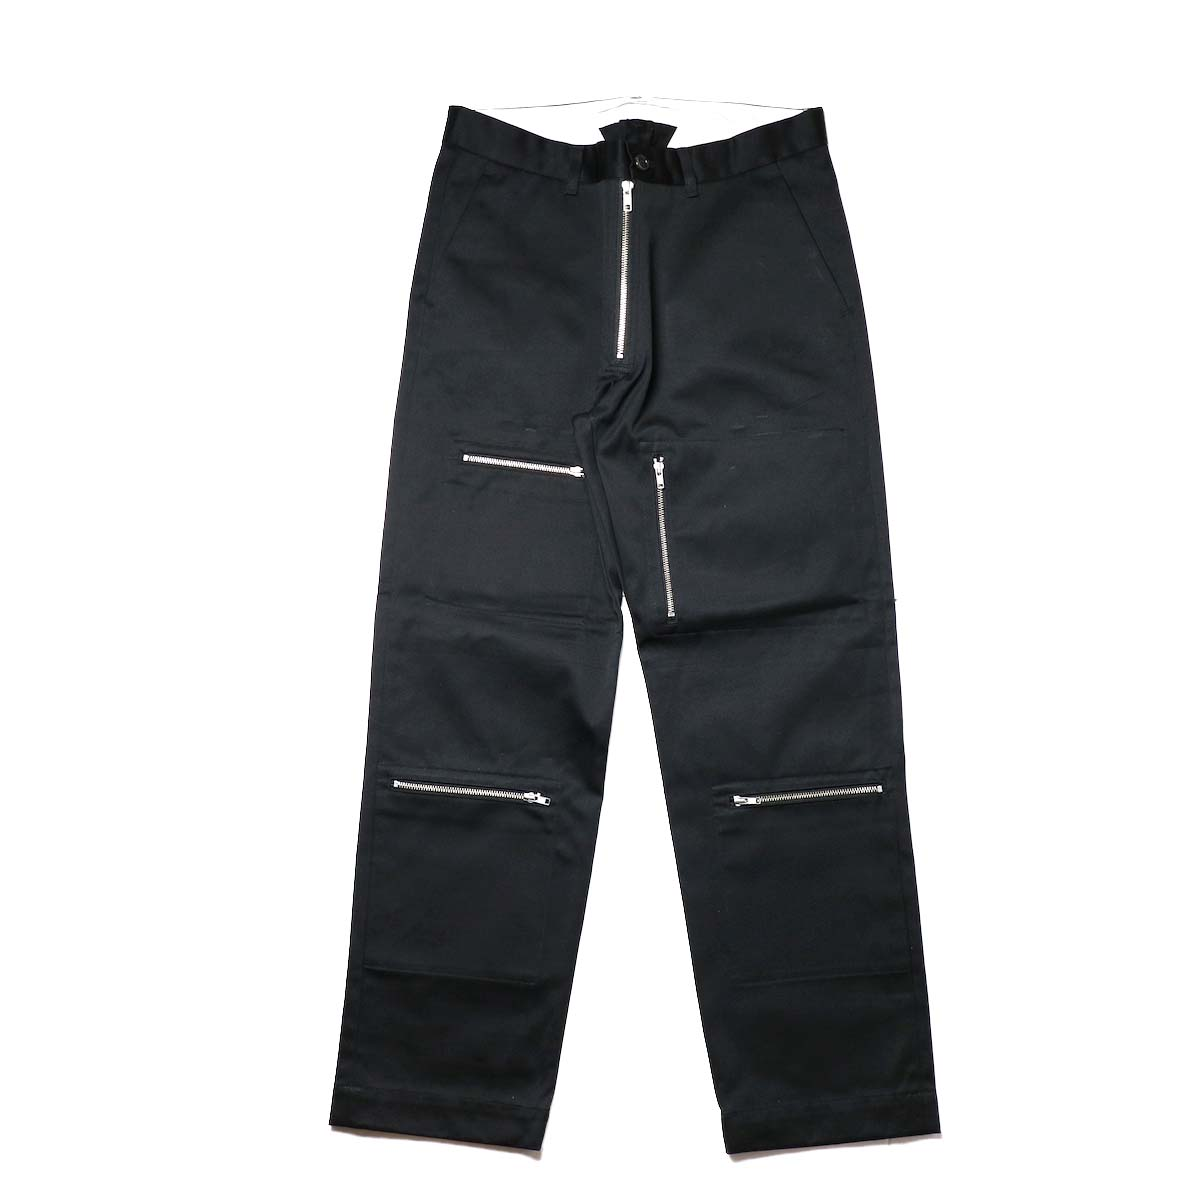 FUTURE PRIMITIVE / FP FZ FLIGHT CHINO PANTS (Black)